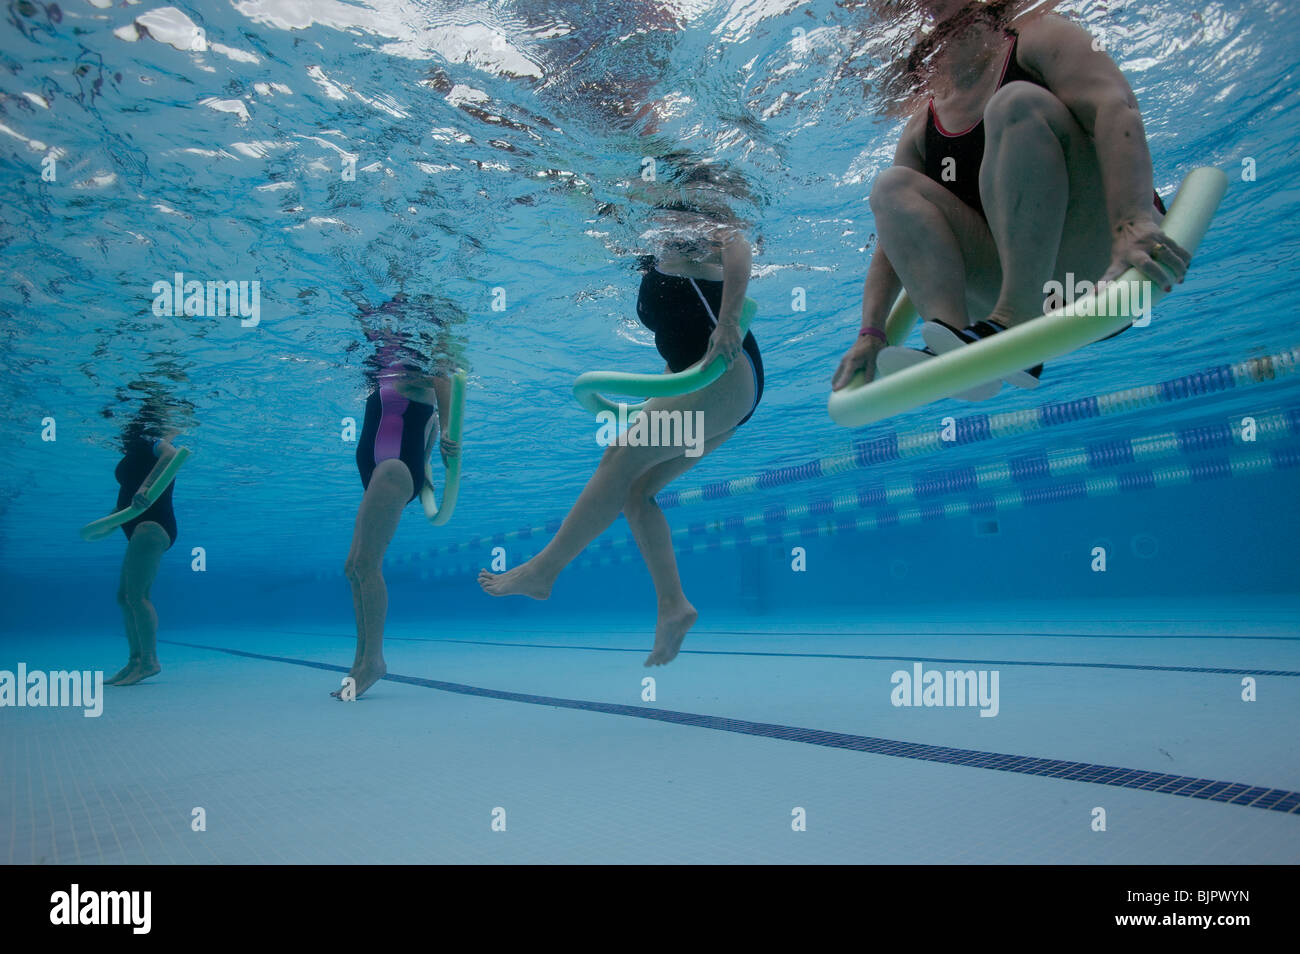 underwater views of an aqua aerobics or water aerobics